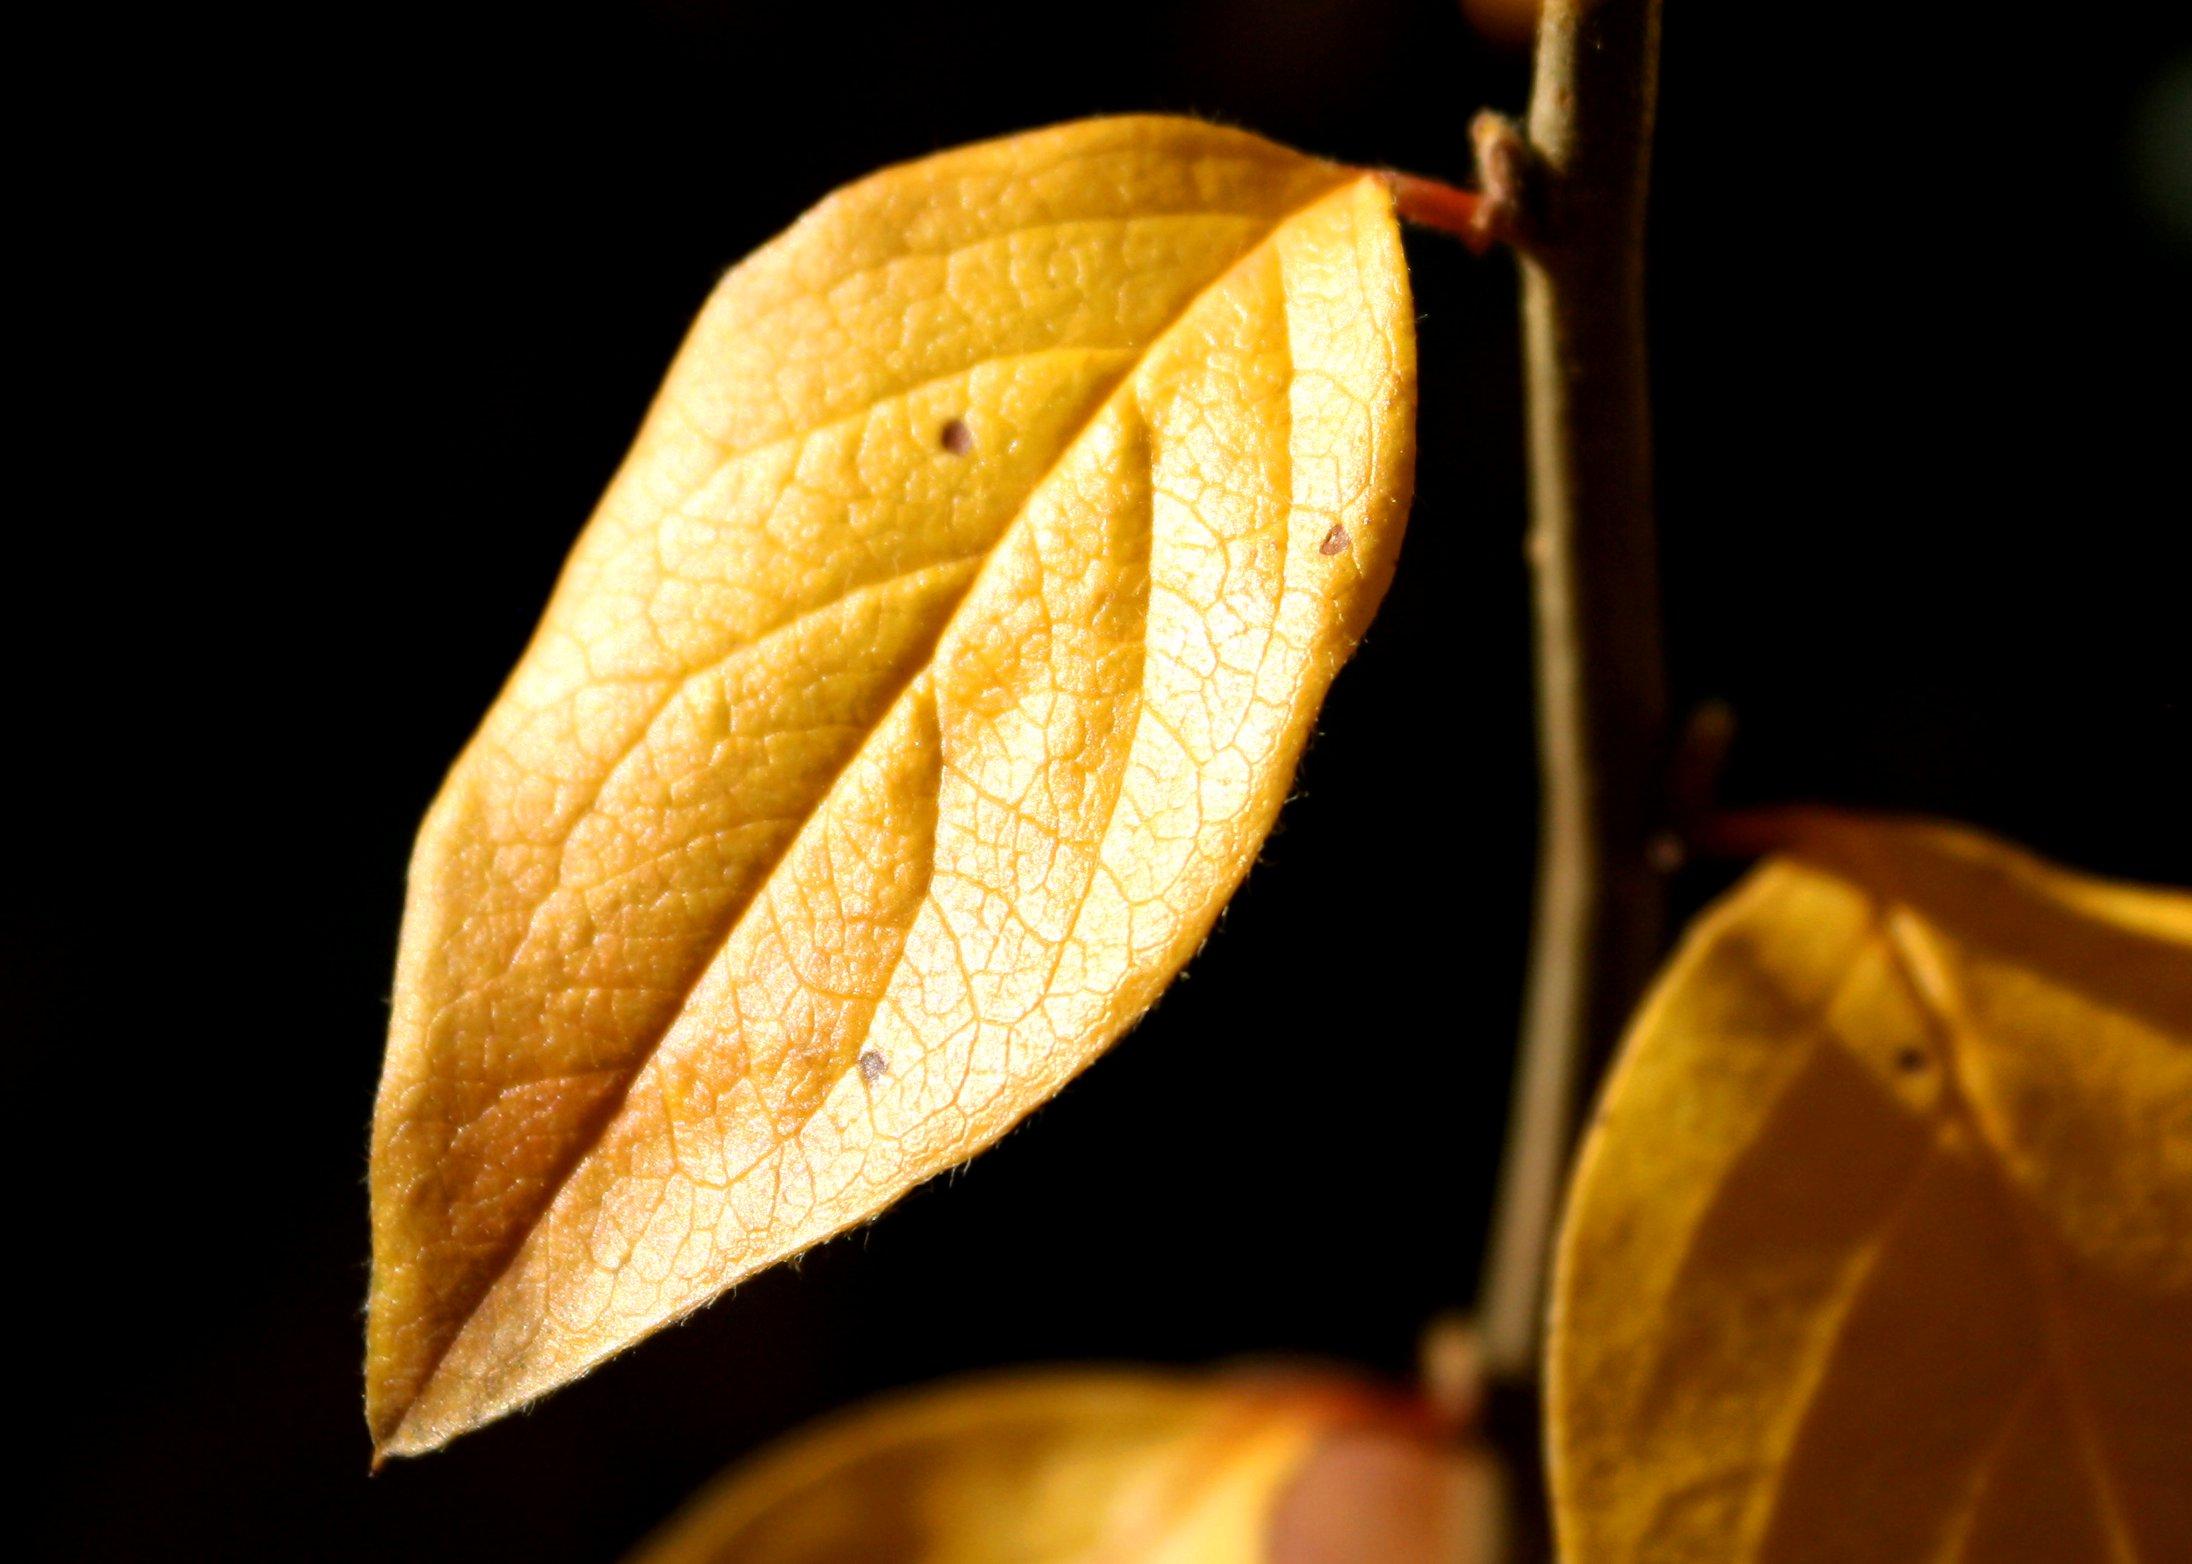 Autumn Leaf Fall Wallpaper Golden Leaf Picture Free Photograph Photos Public Domain